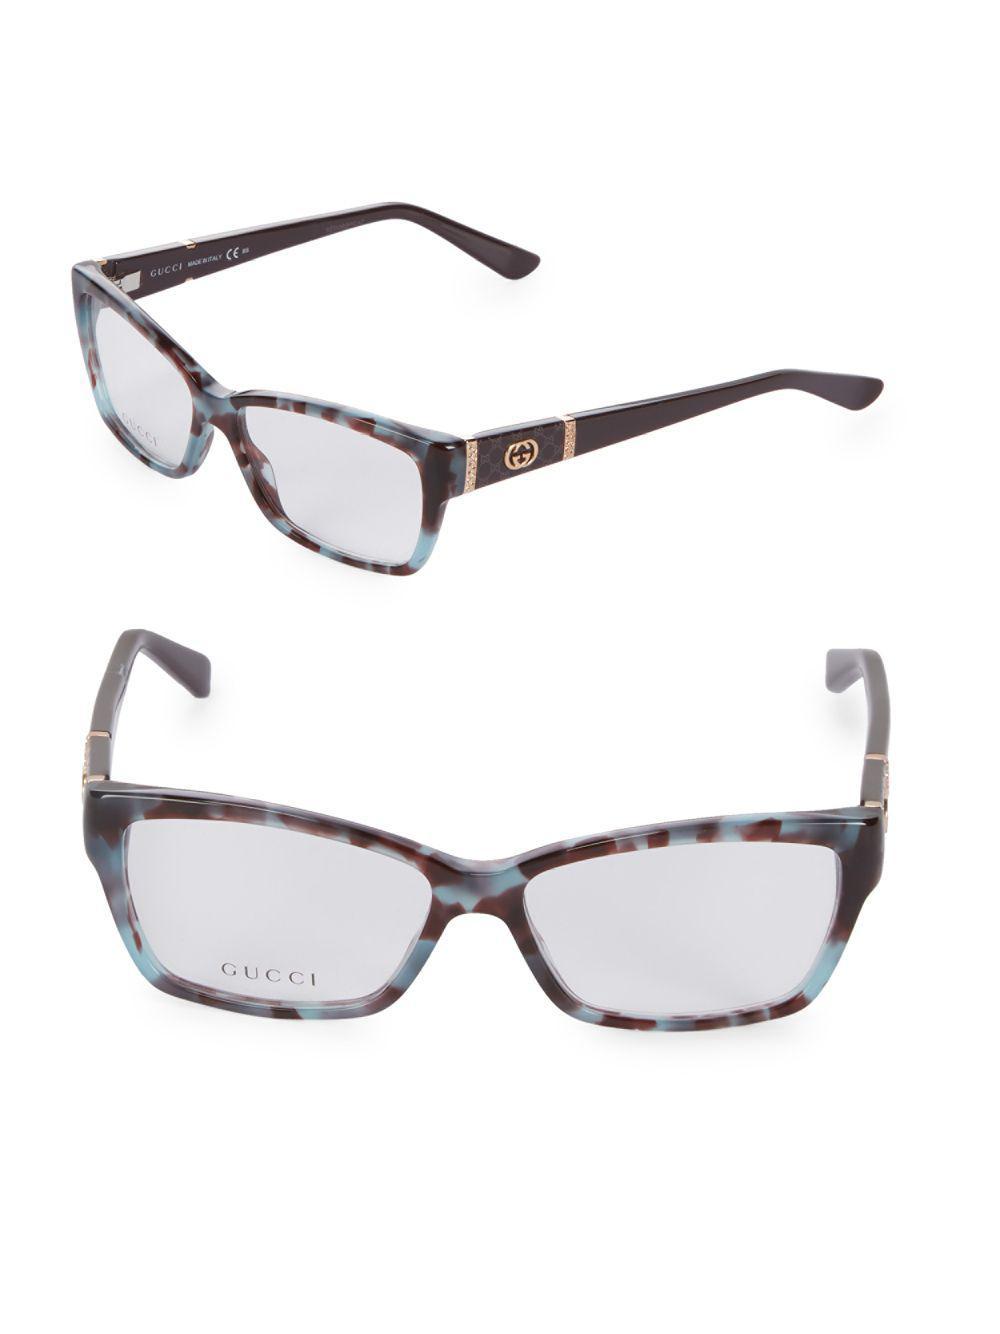 261b13a3931 Gucci - Multicolor 51mm Square Optical Glasses - Lyst. View fullscreen